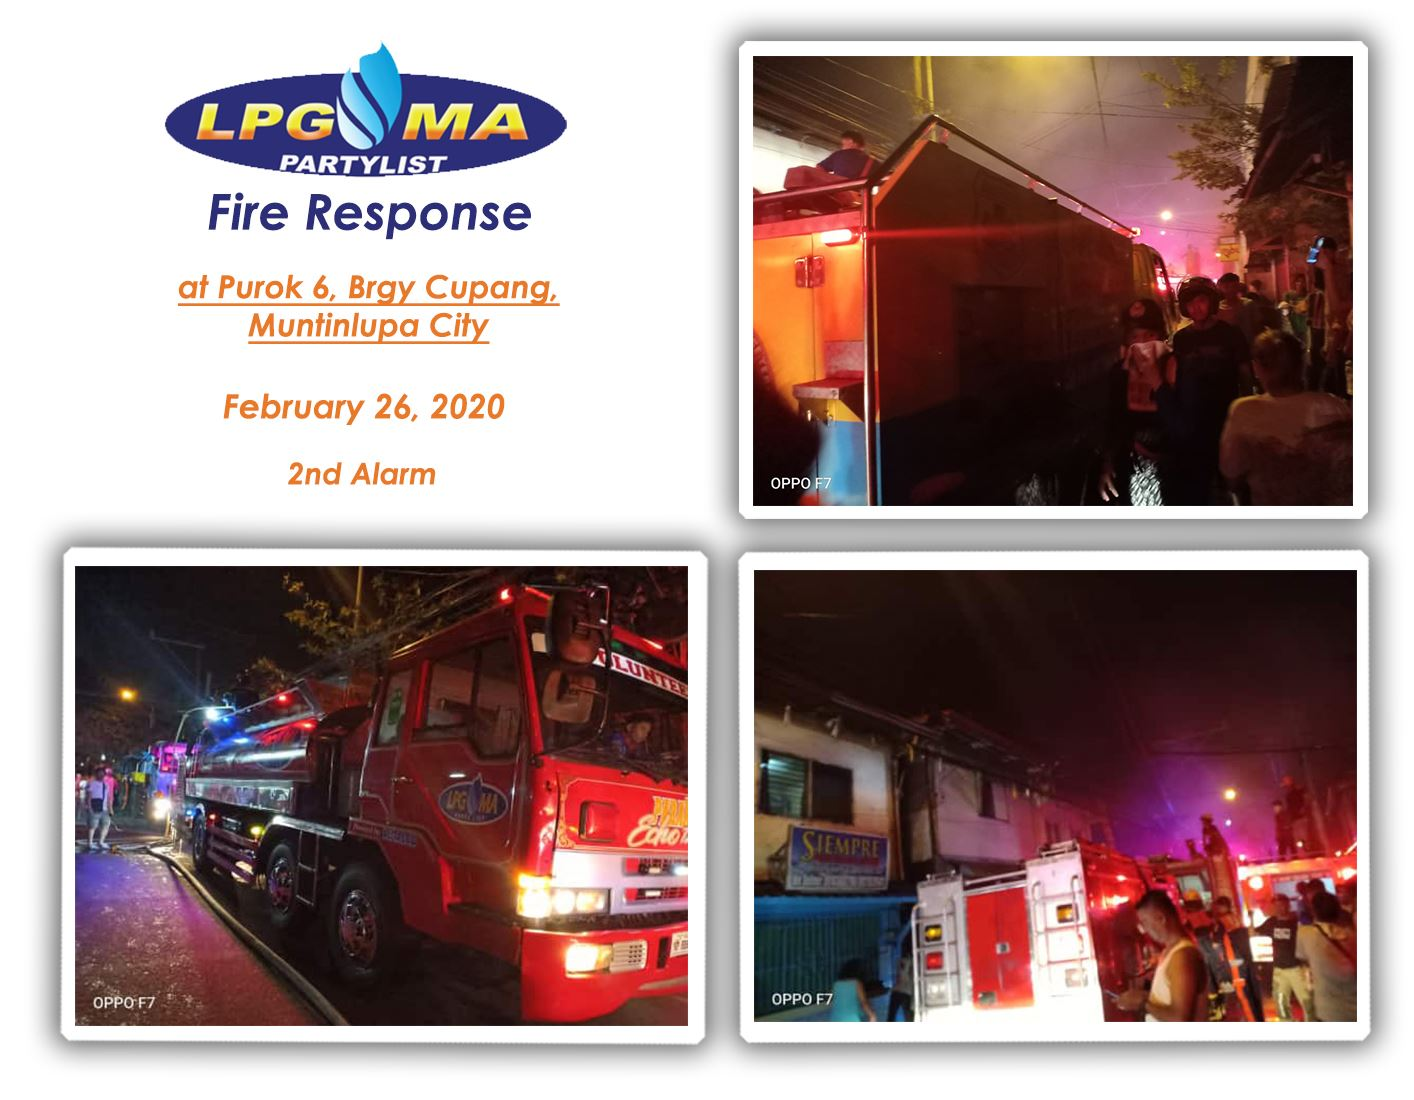 LPGMA Fire Response in Muntinlupa